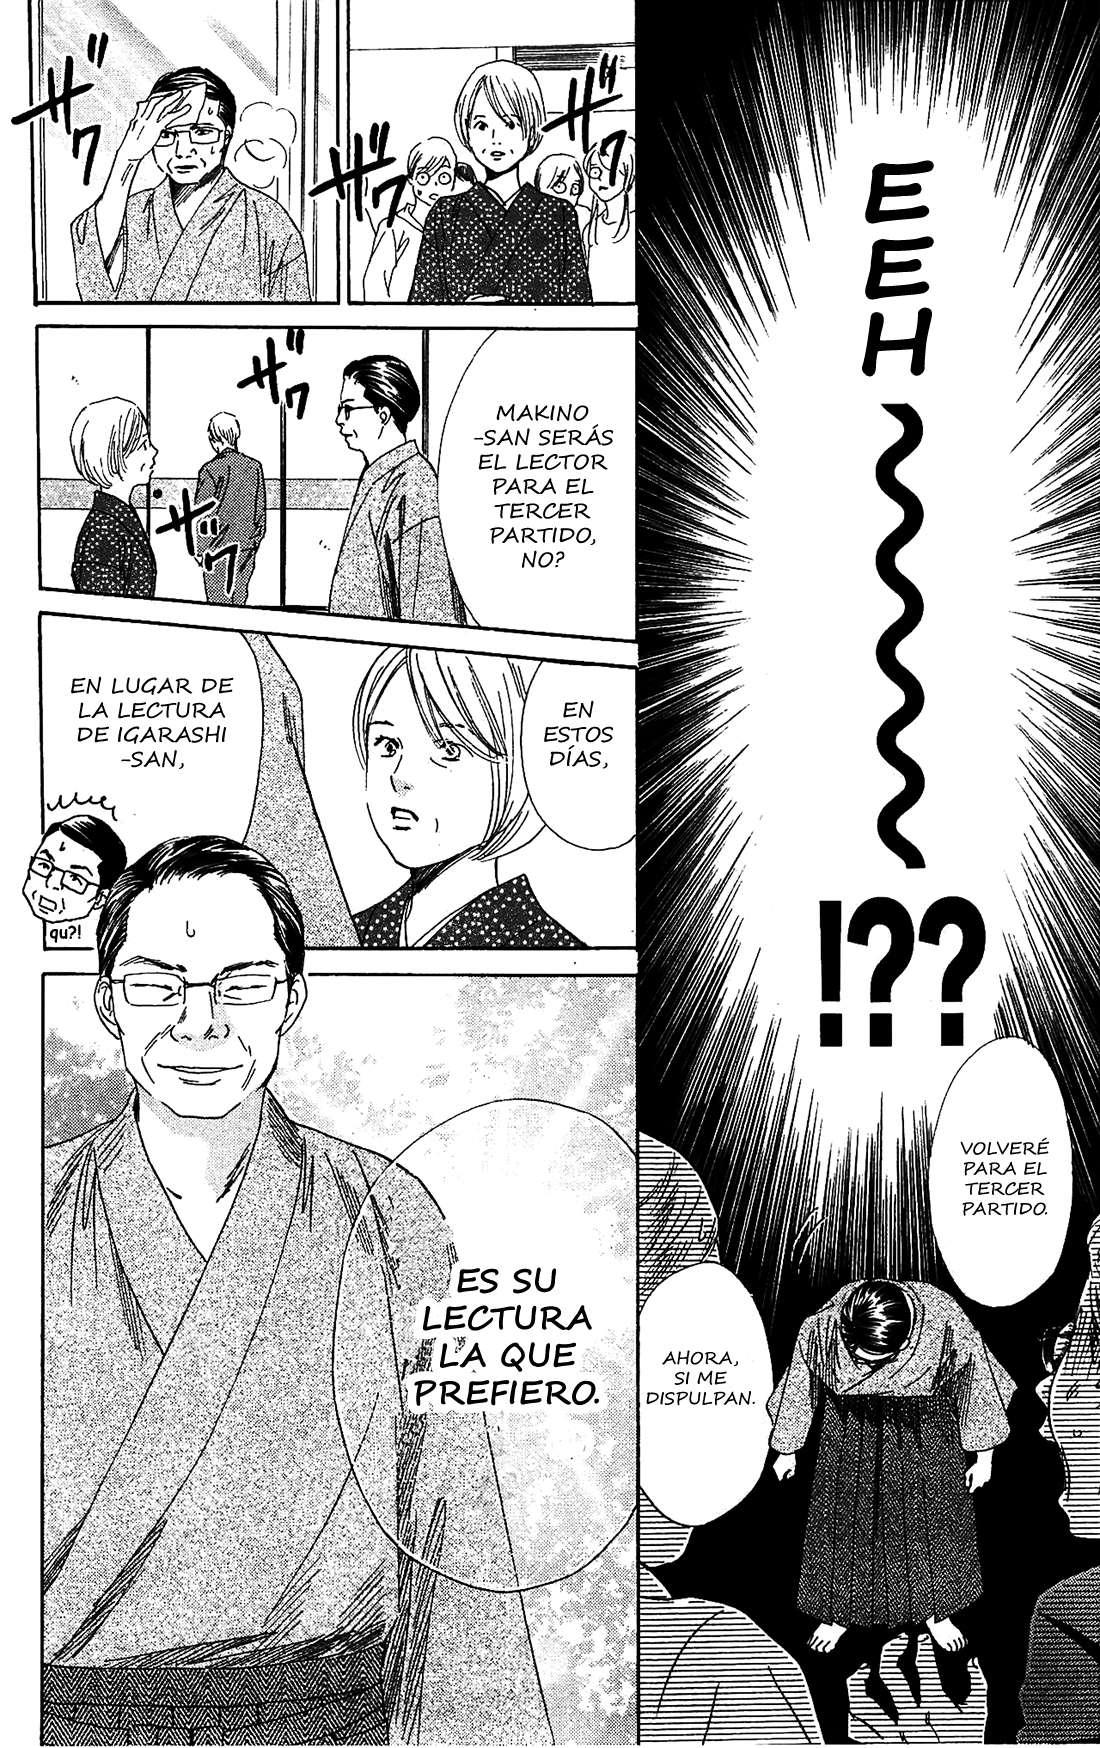 https://c5.ninemanga.com/es_manga/32/1824/398206/b32768df2cfff3a5ab1a78d093711e2c.jpg Page 29